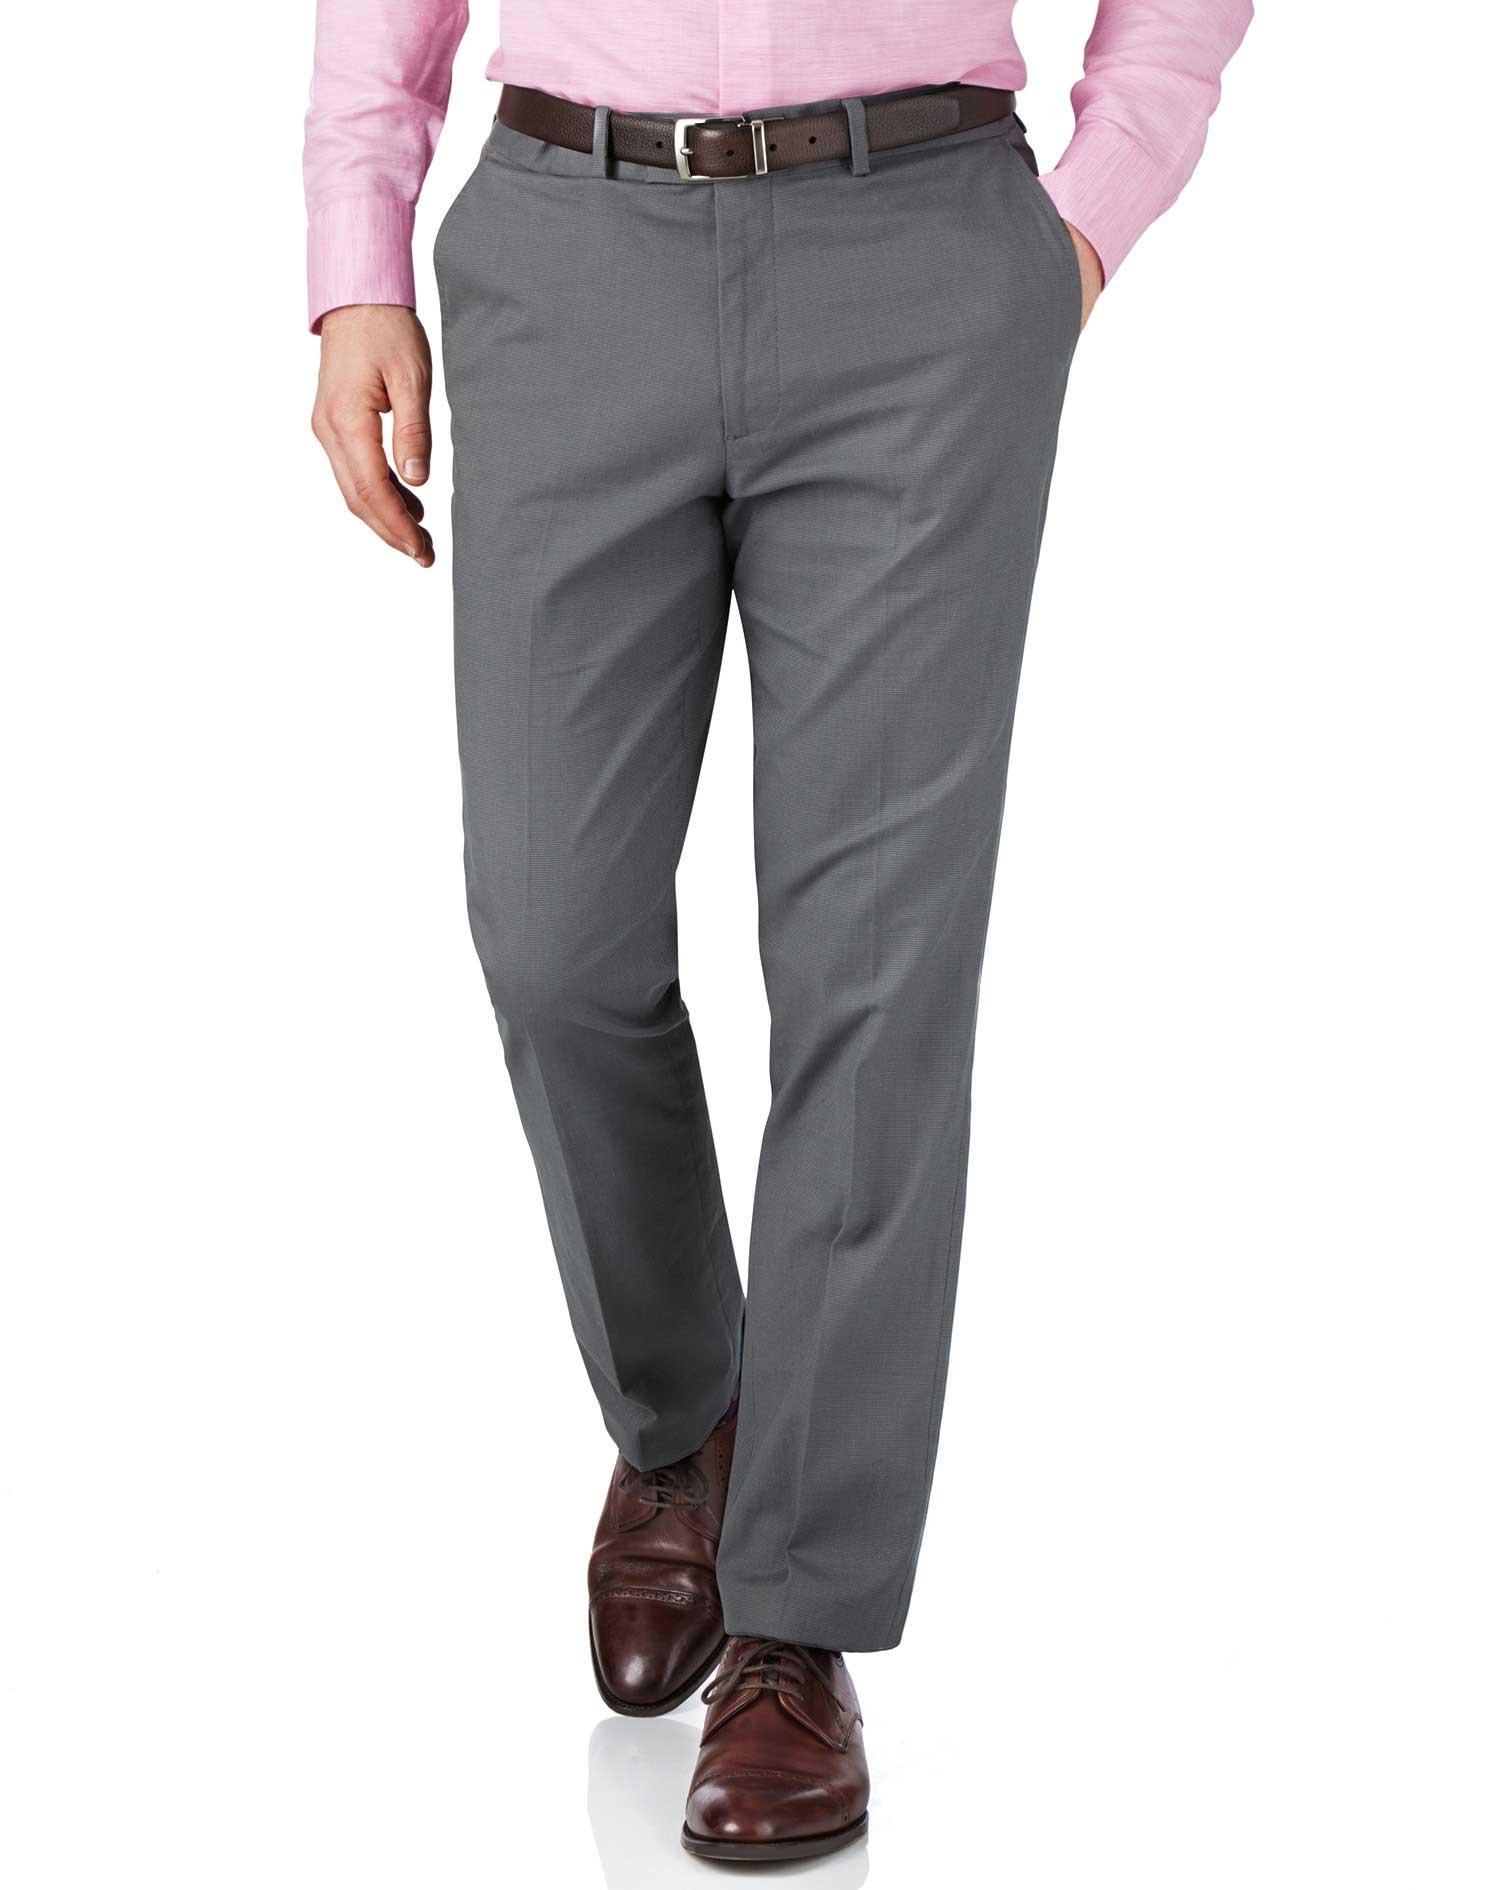 Grey Slim Fit Pin Dot Trousers Size W40 L32 by Charles Tyrwhitt